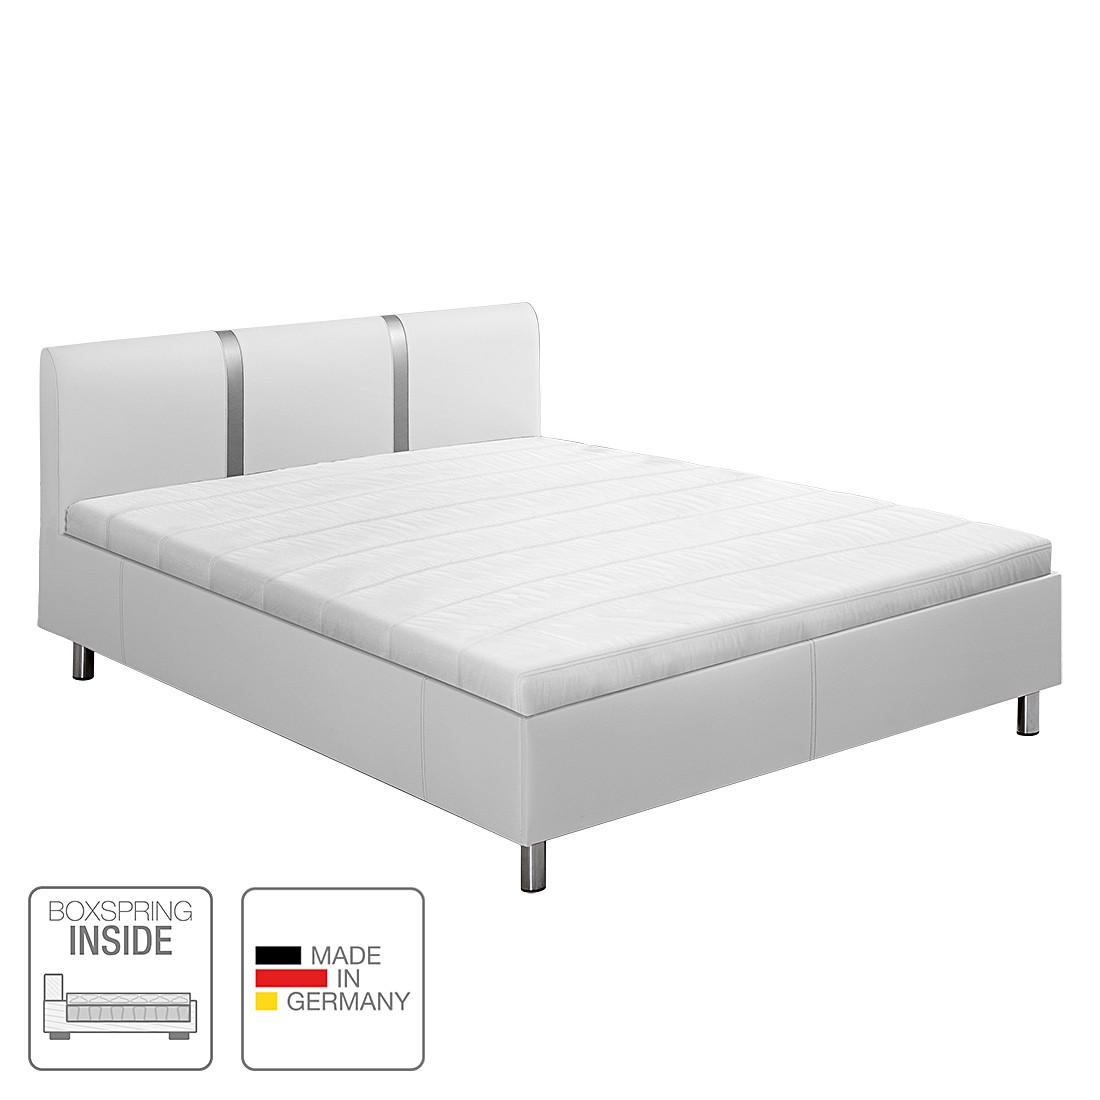 Boxspring-Inside-Bett Caya - Kunstleder - 180 x 200cm - H4 ab 100 kg - Tonnentaschenfederkernmatratze - starrer Lattenrost mit 19 Federholzleisten - Weiß, Nova Dream Sleepline